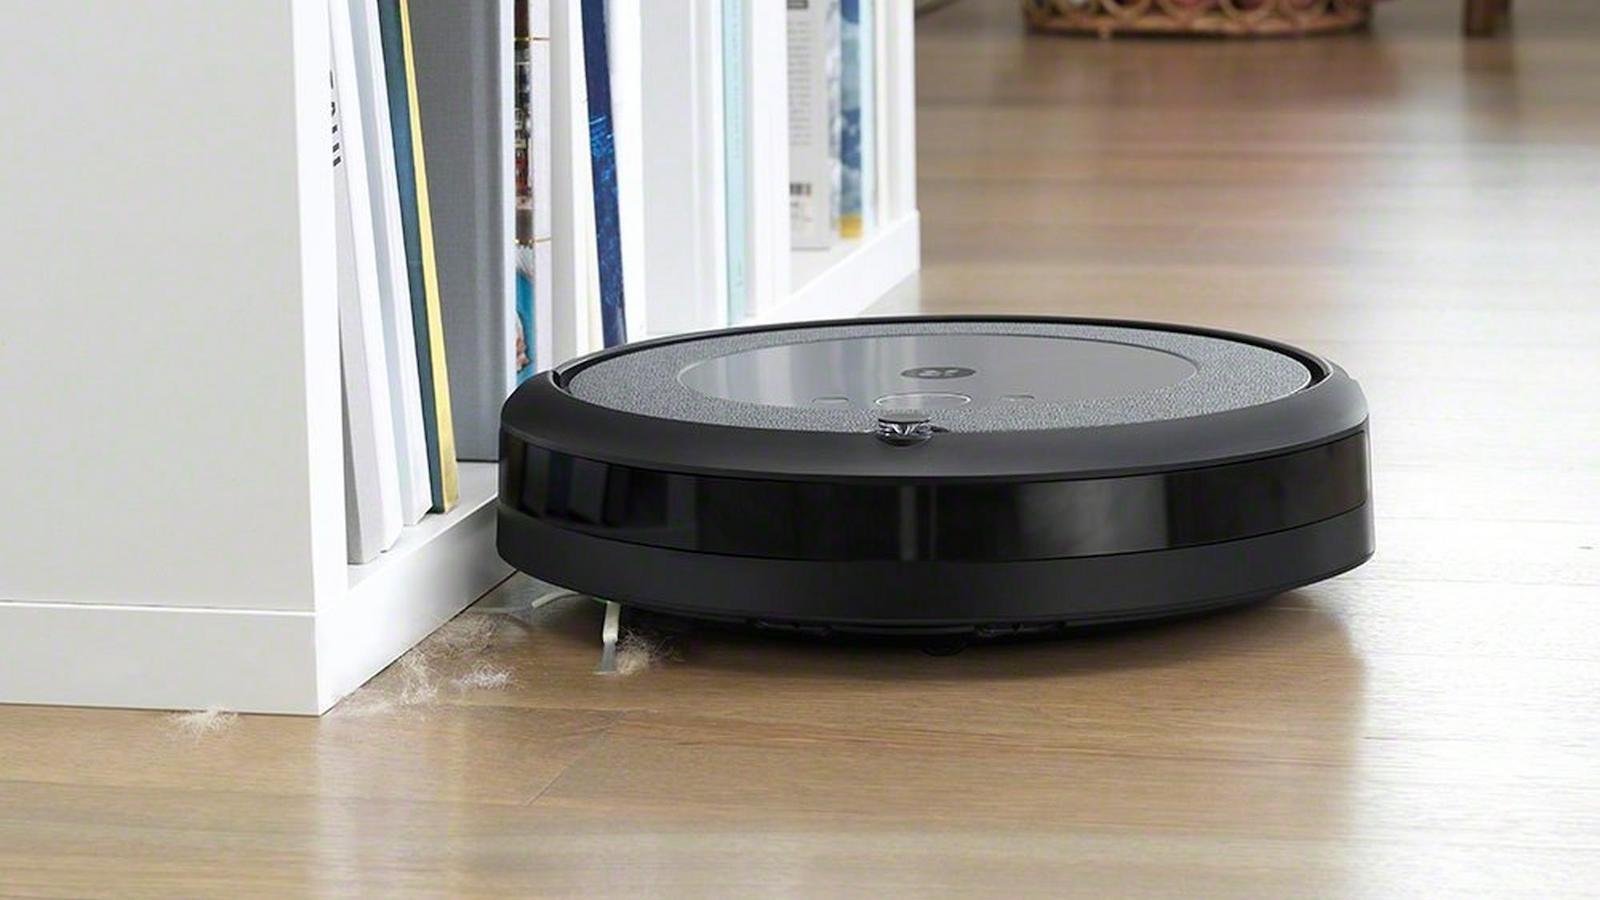 iRobot Roomba i3 powerful robot vacuum uses state-of-the-art tracking sensors to navigate